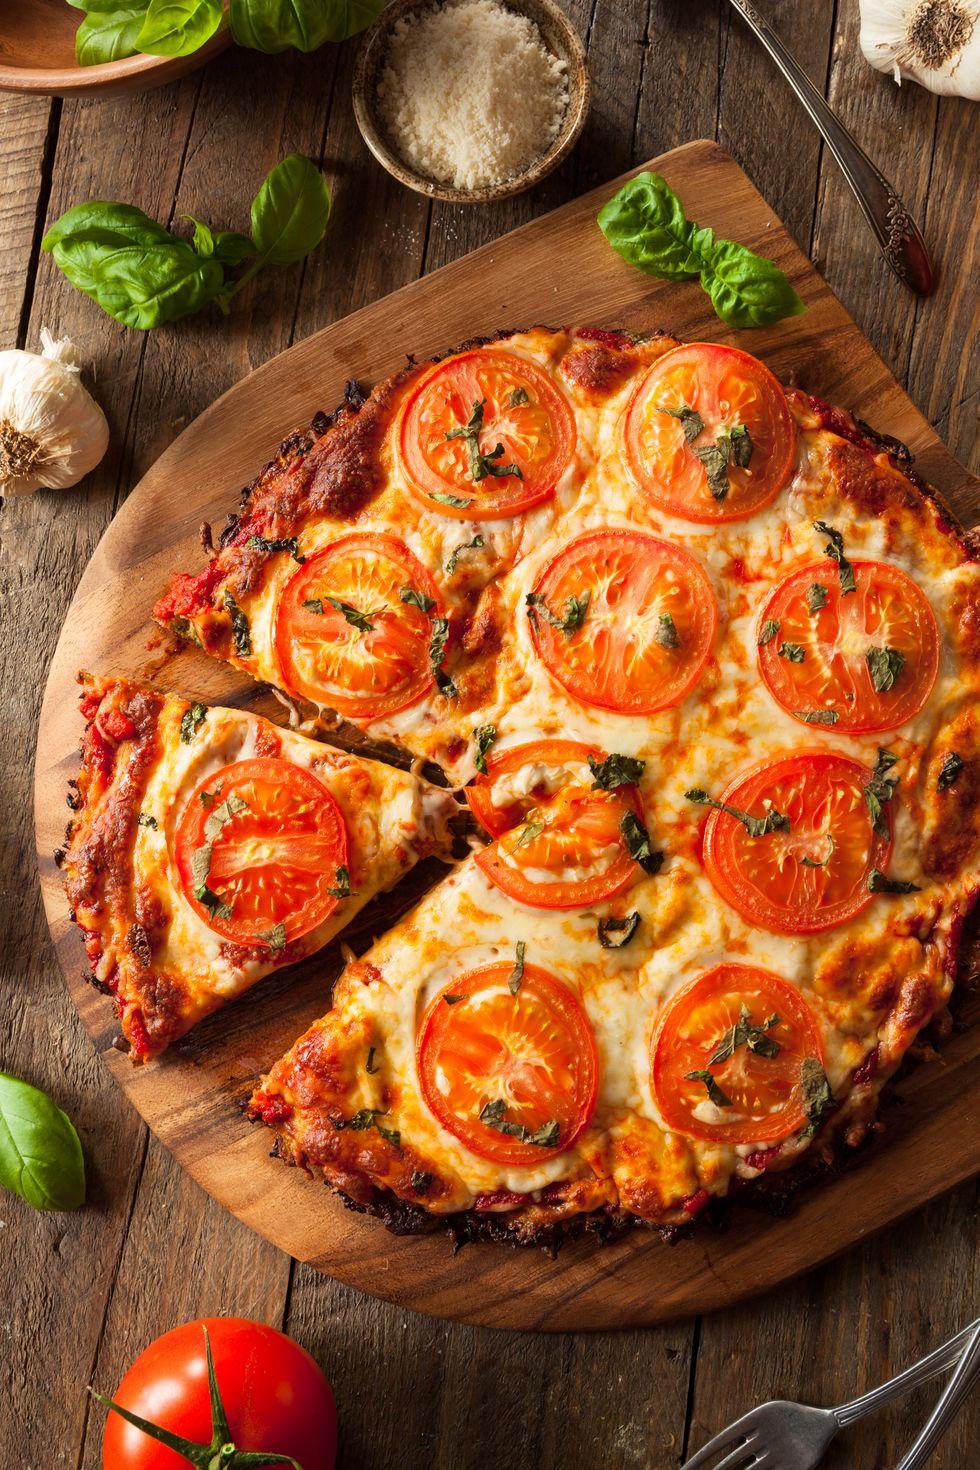 Tia Mowry's Tomato & Basil Cauliflower Pizza